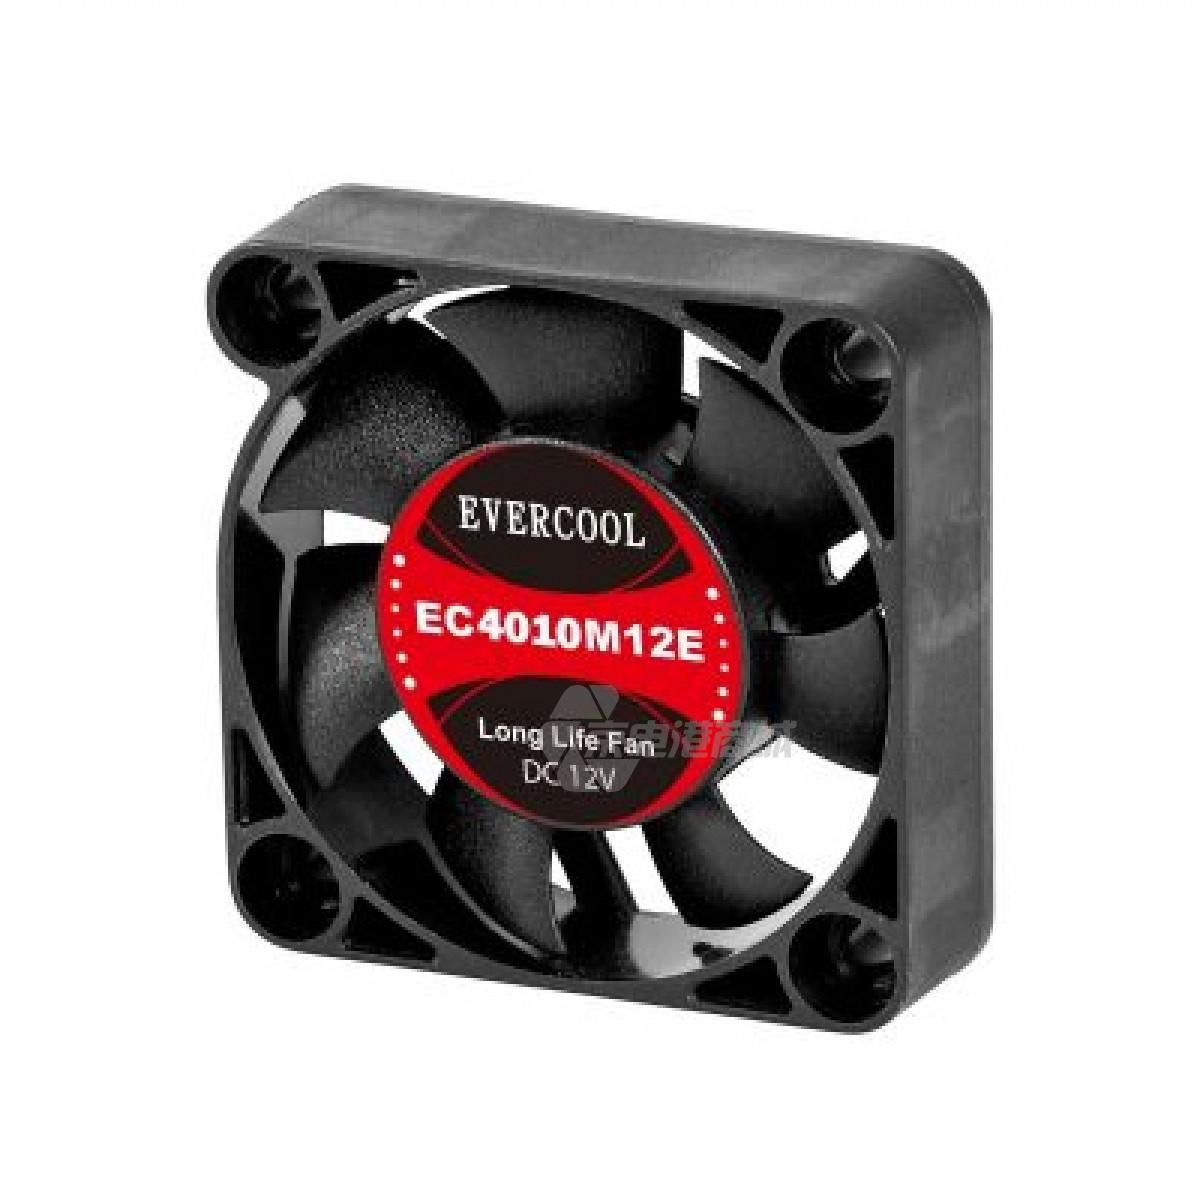 EVERCOOL EC4010M12E 12VDC 40x40x10mm 4010 SERIES